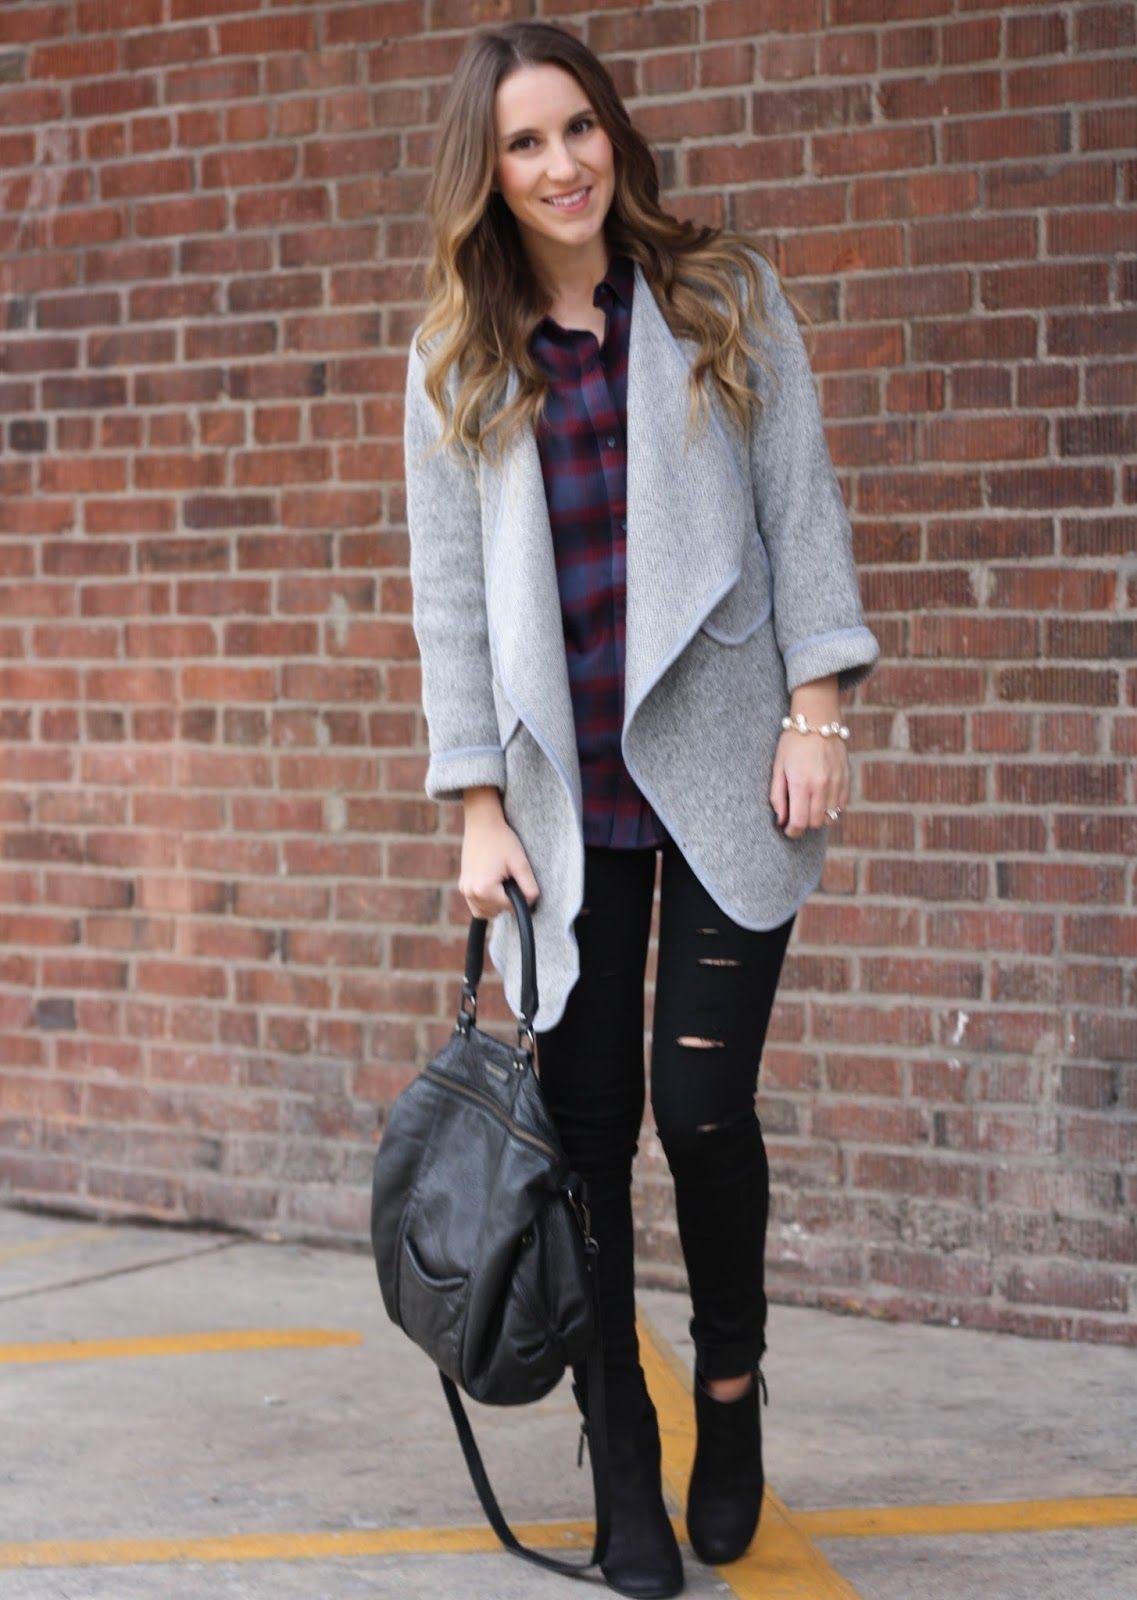 Flannel shirt with khaki pants  Casual Plaid  Plaid Fall winter and Fall winter fashion